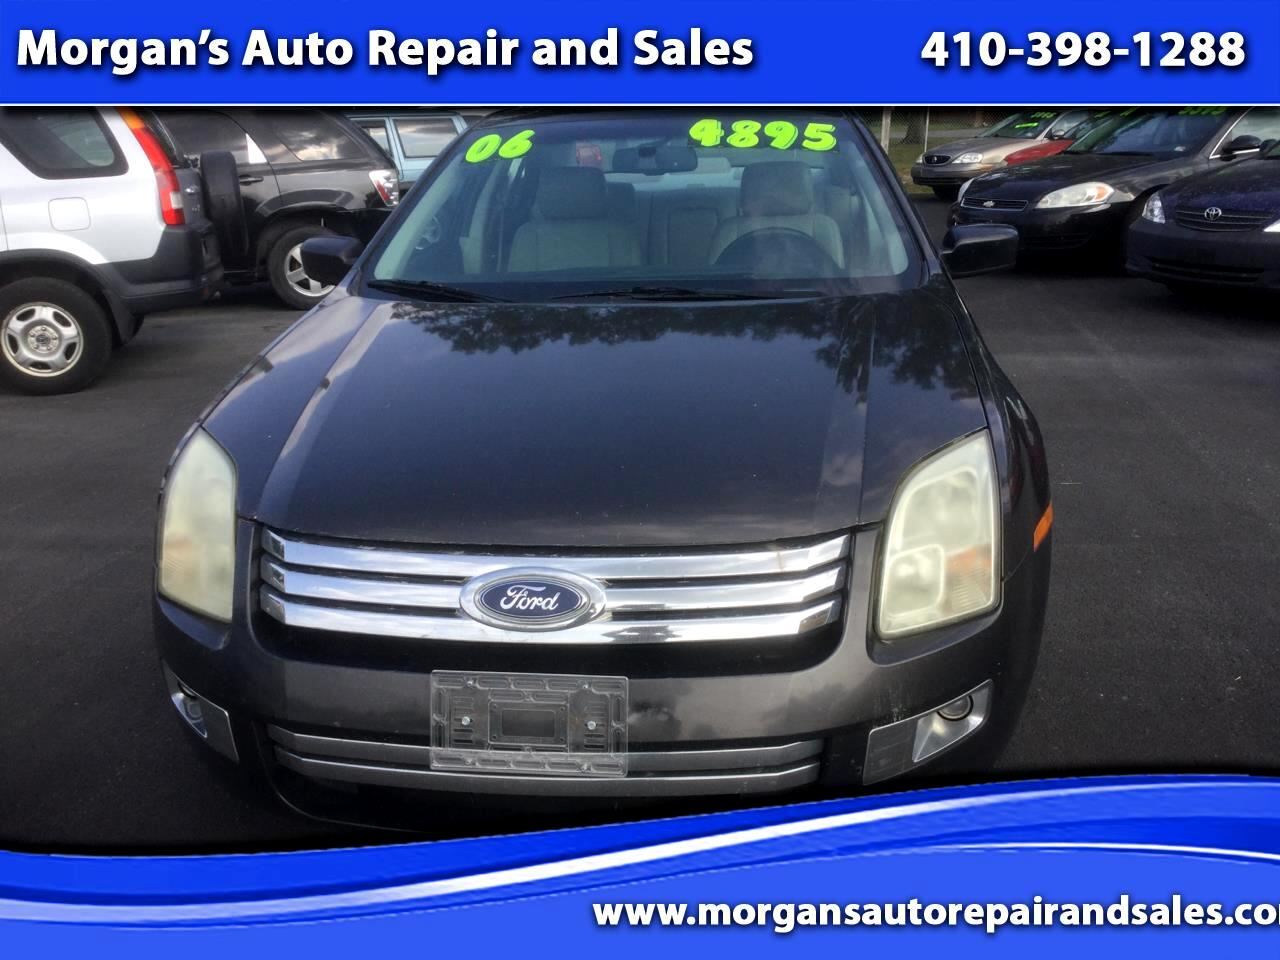 Ford Fusion V6 SEL 2006